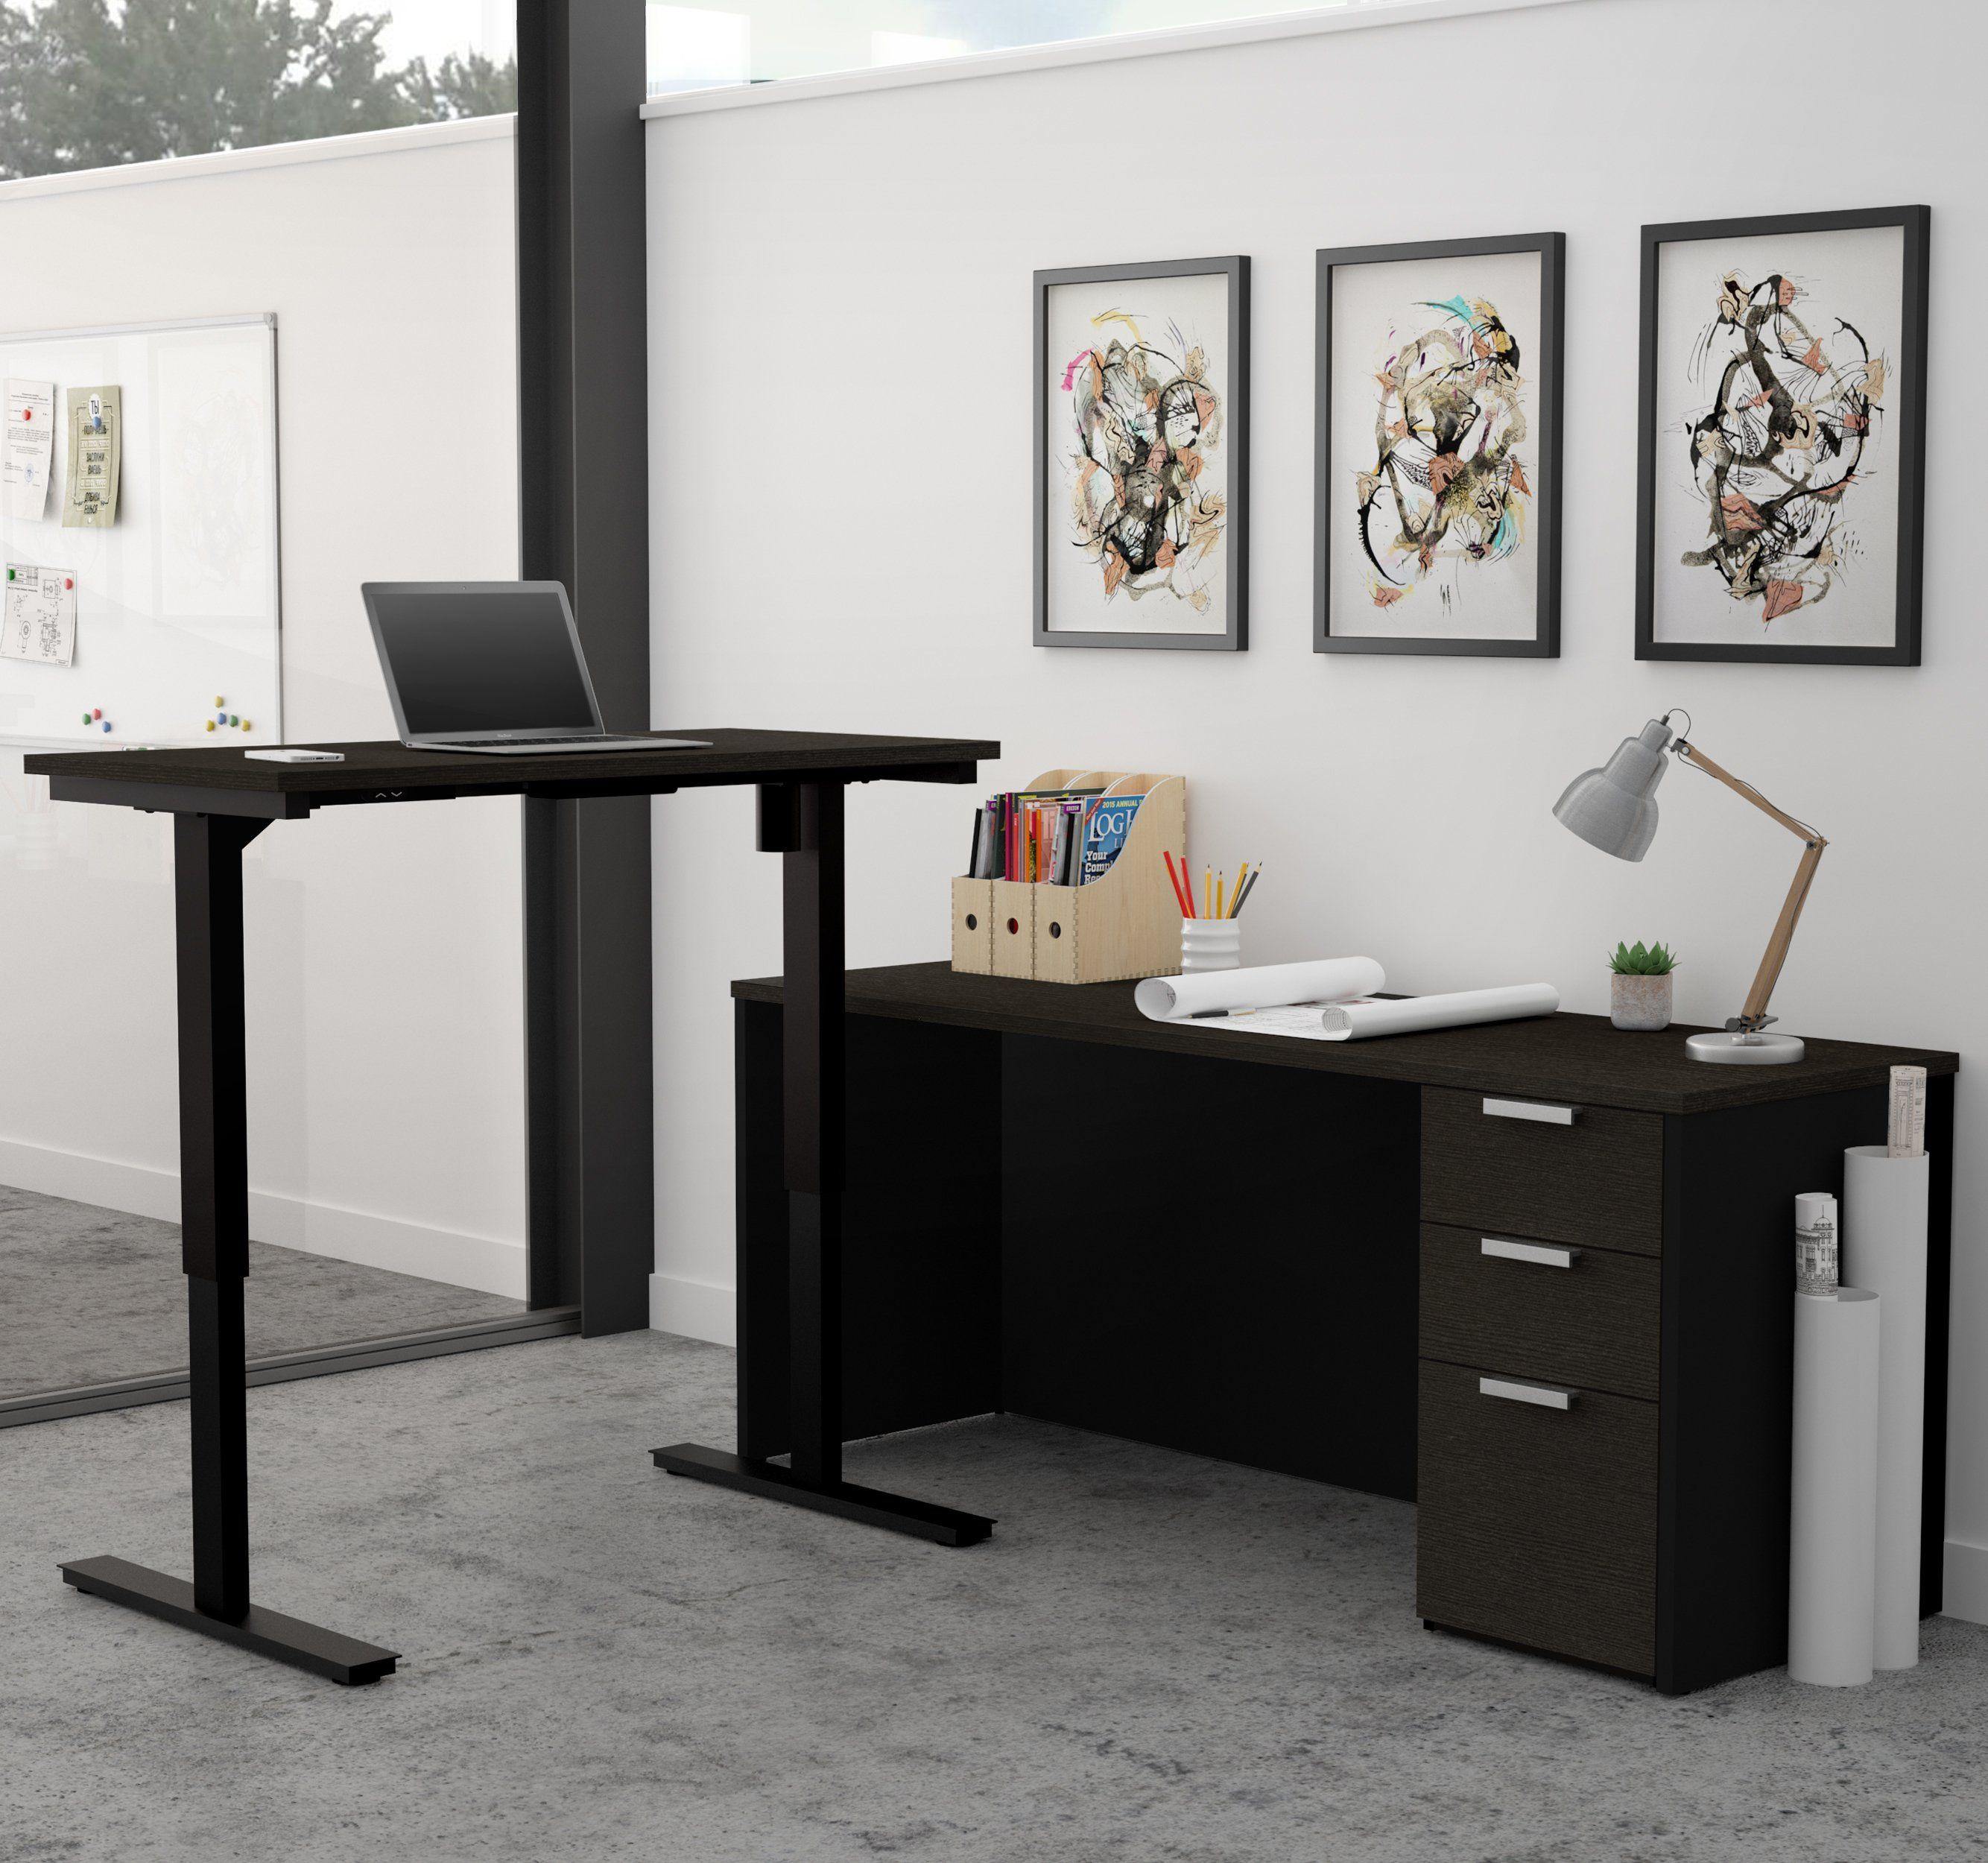 Deep Gray & Black Single Pedestal Desk with Height